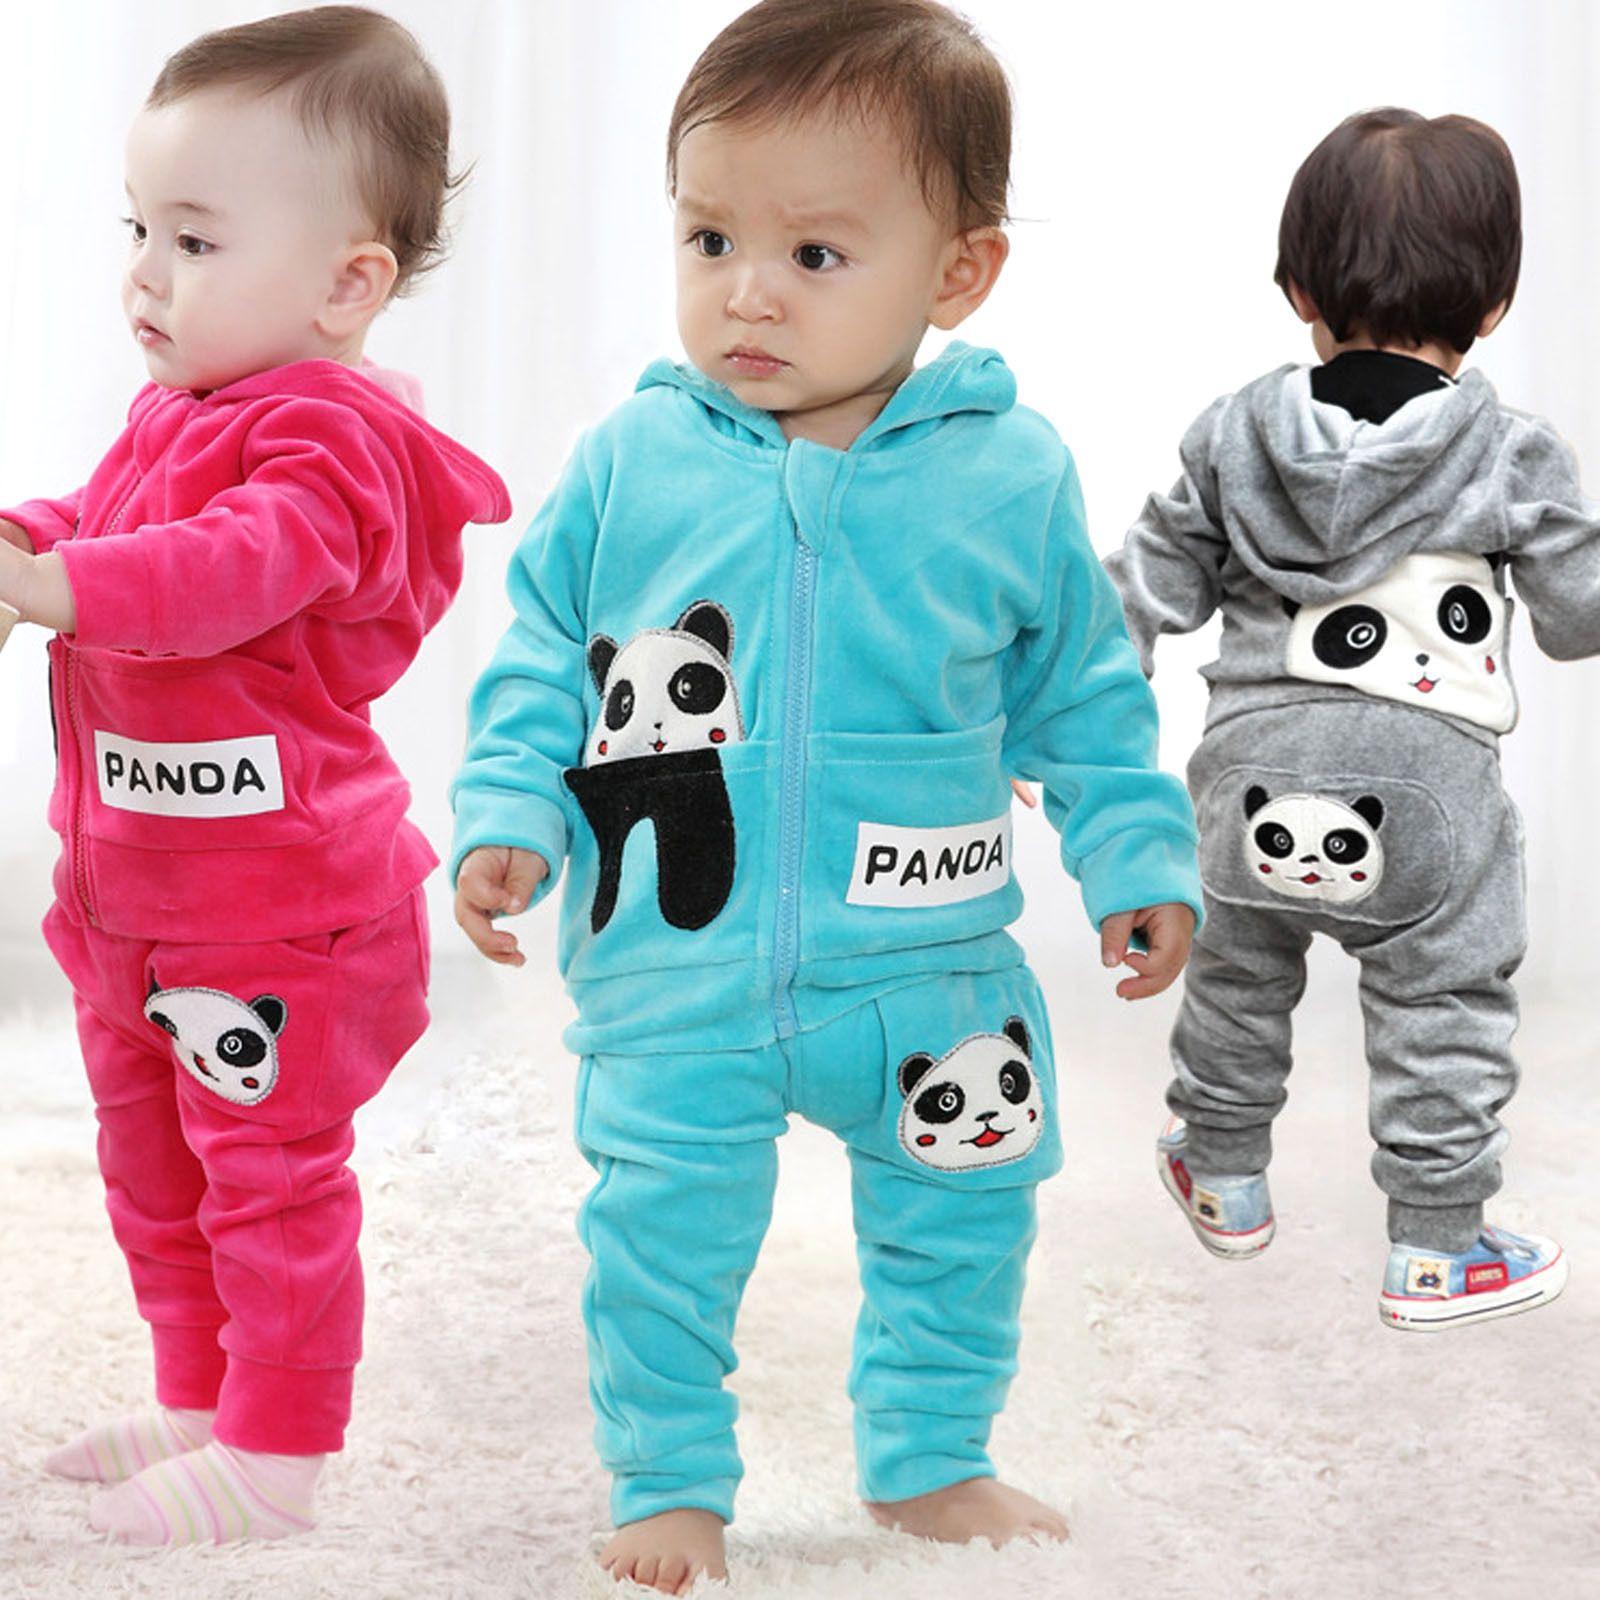 4fcf65626 ملابس اطفال اولاد , اجمل لباس للاولاد - حبيبي